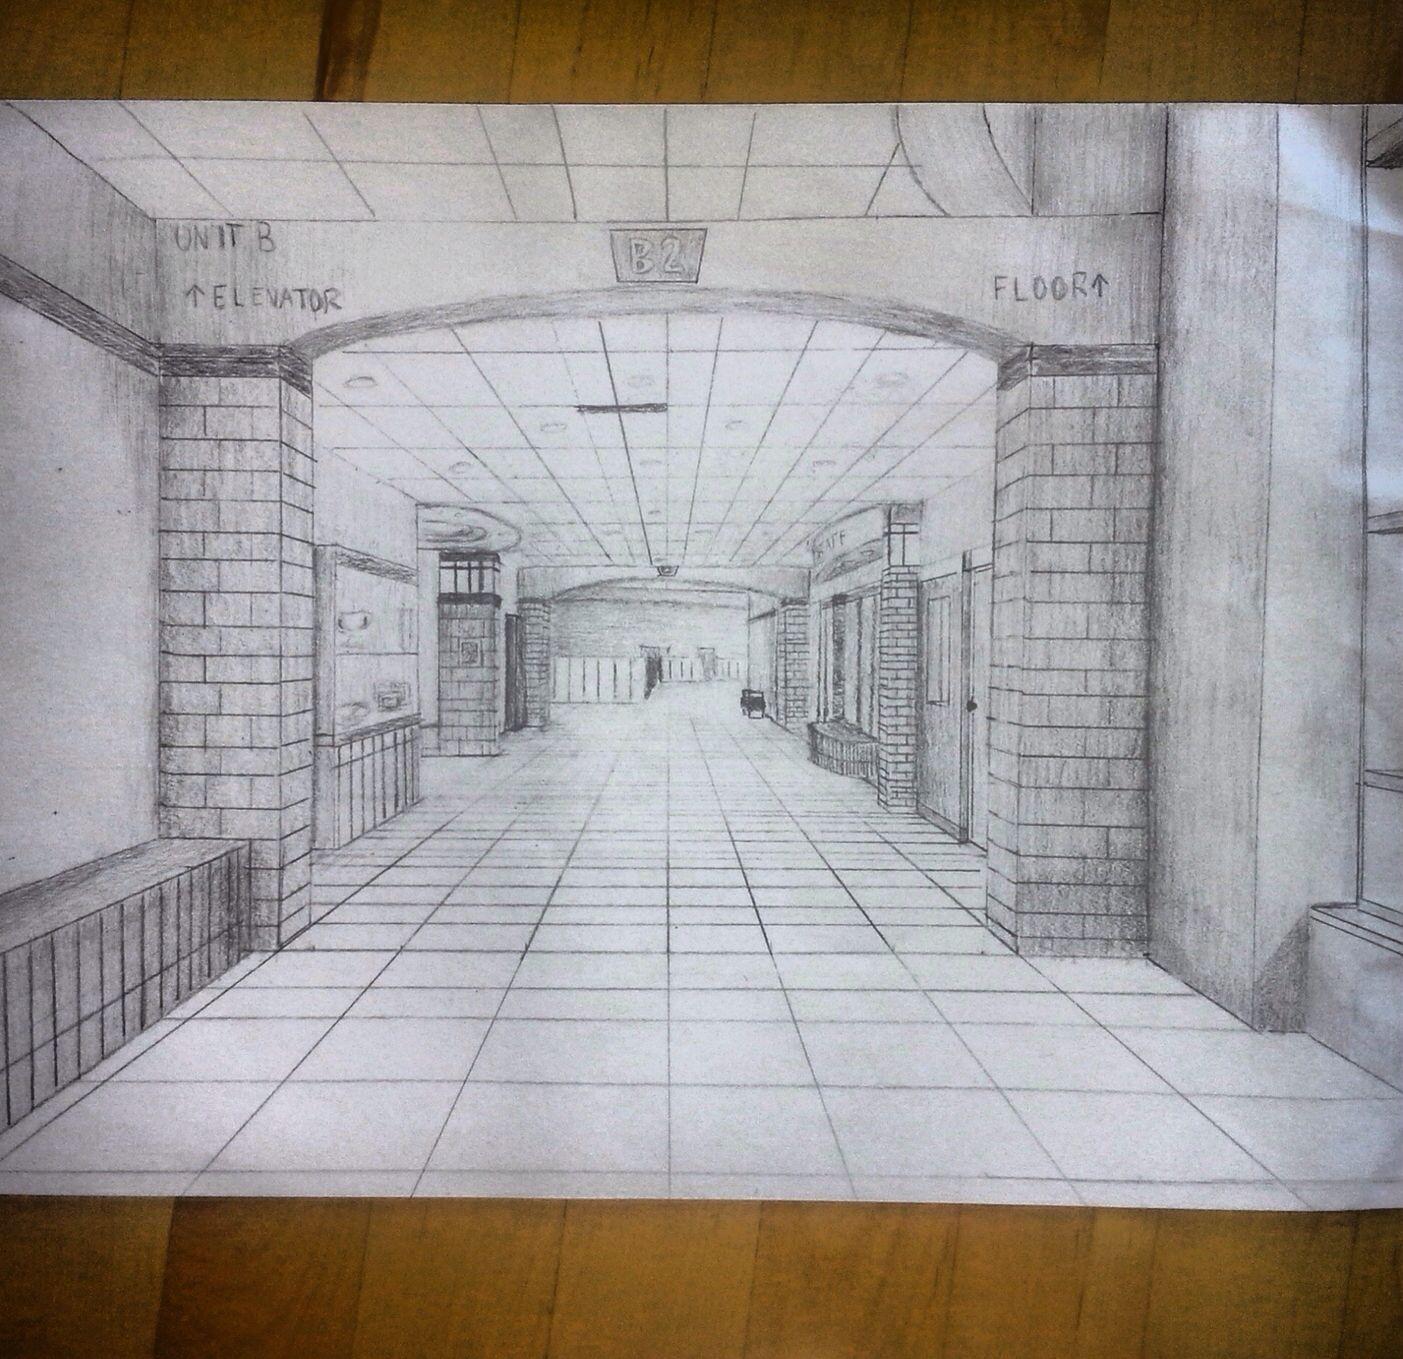 One Point Perspective Hallway That I Drew